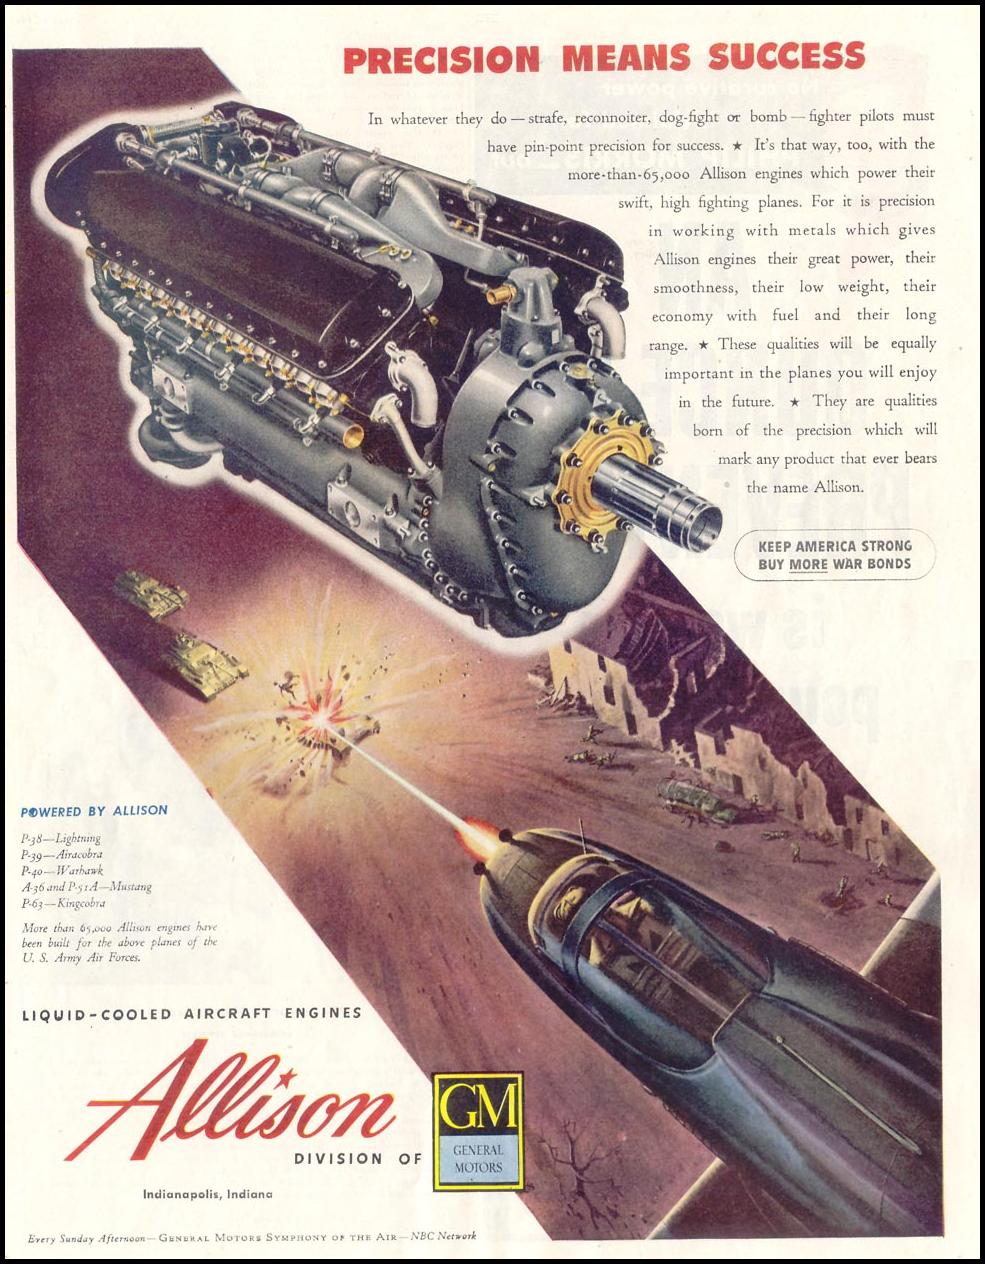 ALLISON LIQUID-COOLED AIRCRAFT ENGINES SATURDAY EVENING POST 05/19/1945 p. 45